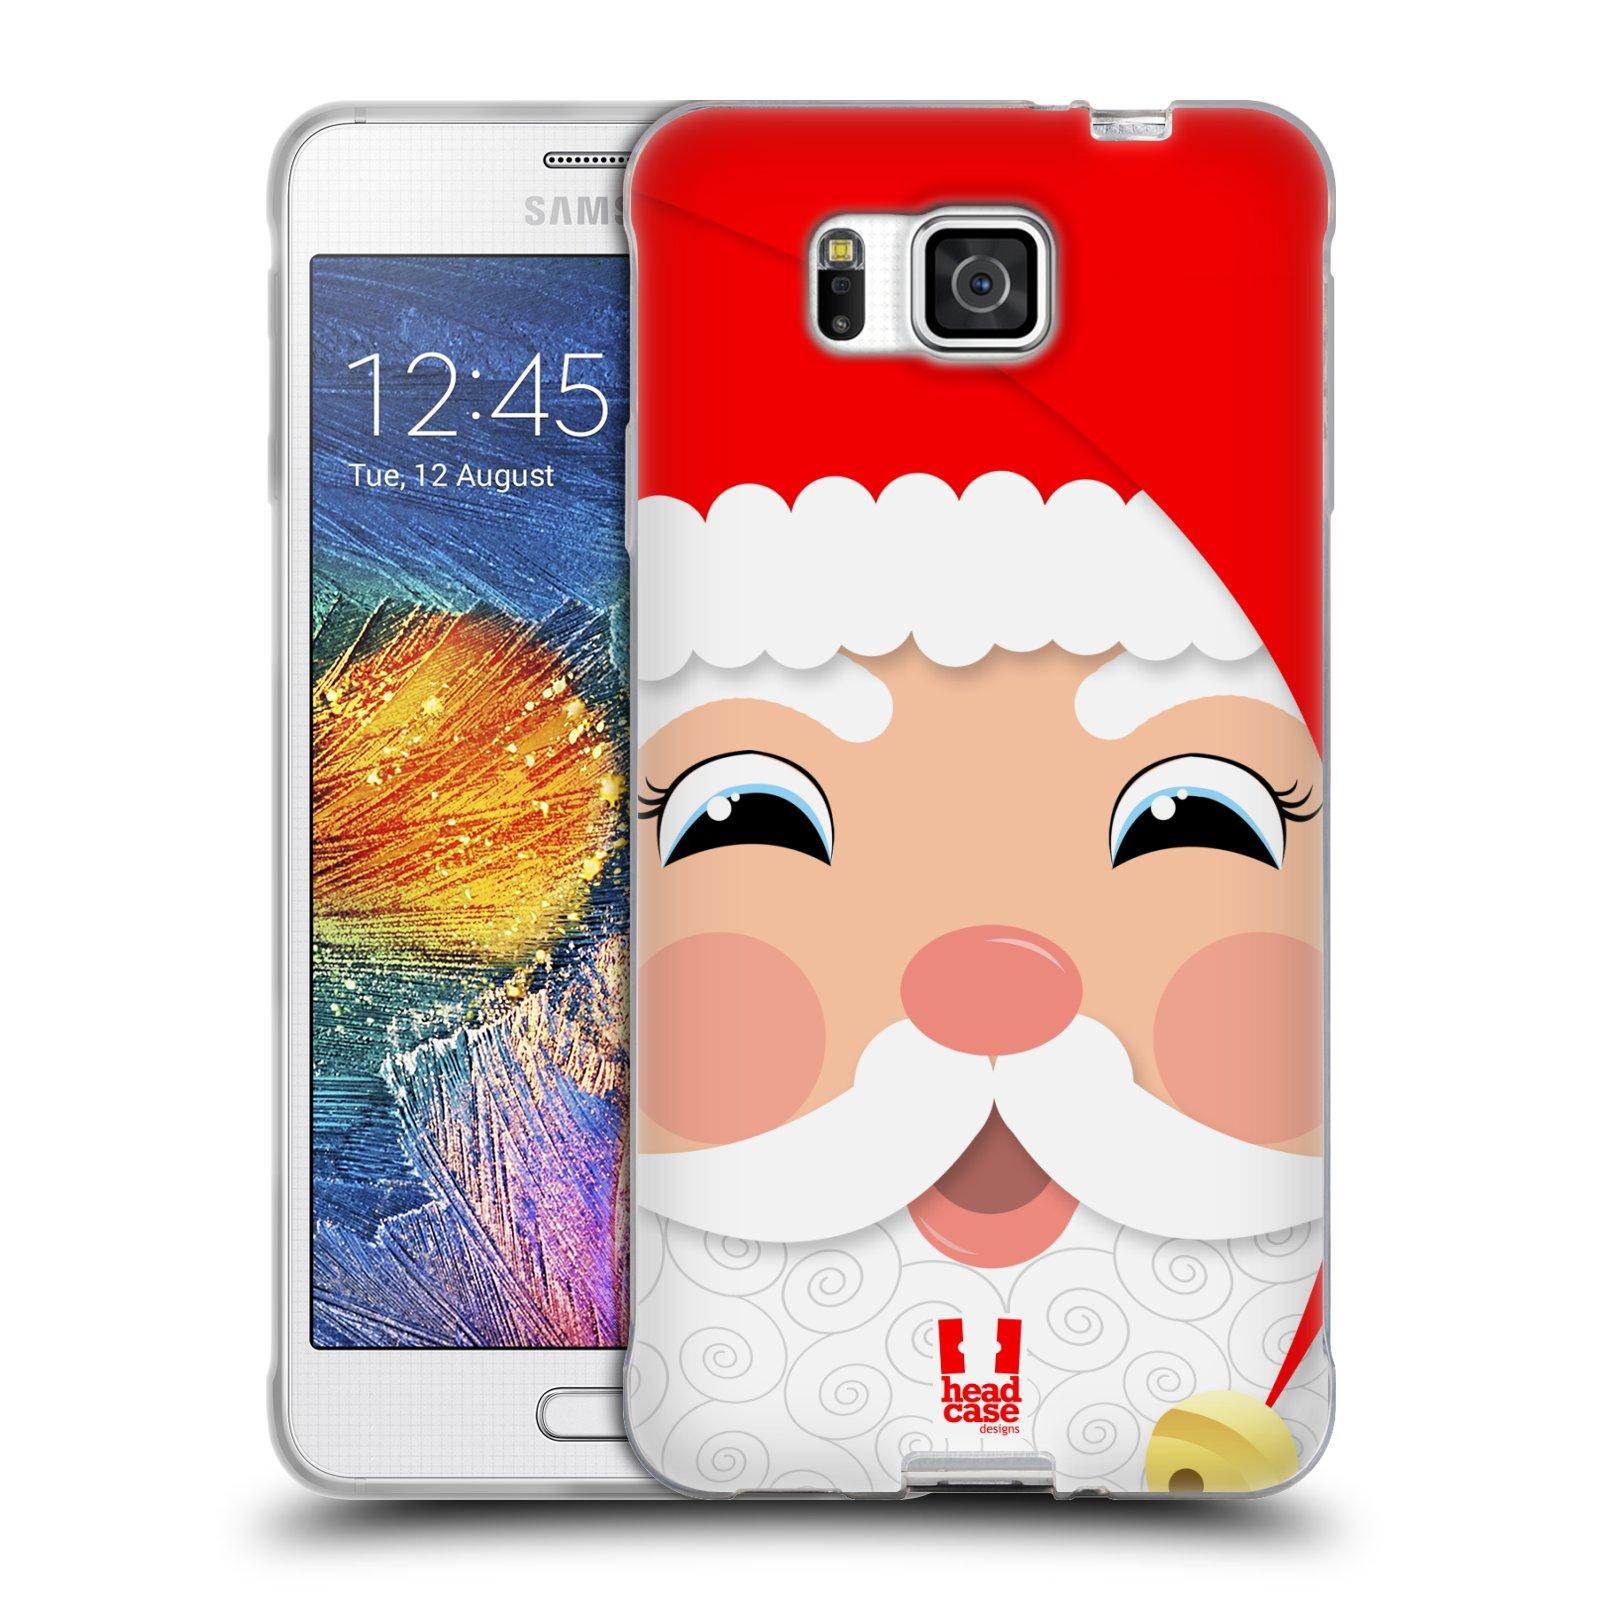 HEAD CASE silikonový obal na mobil Samsung Galaxy ALPHA vzor Vánoční tváře kreslené SANTA CLAUS